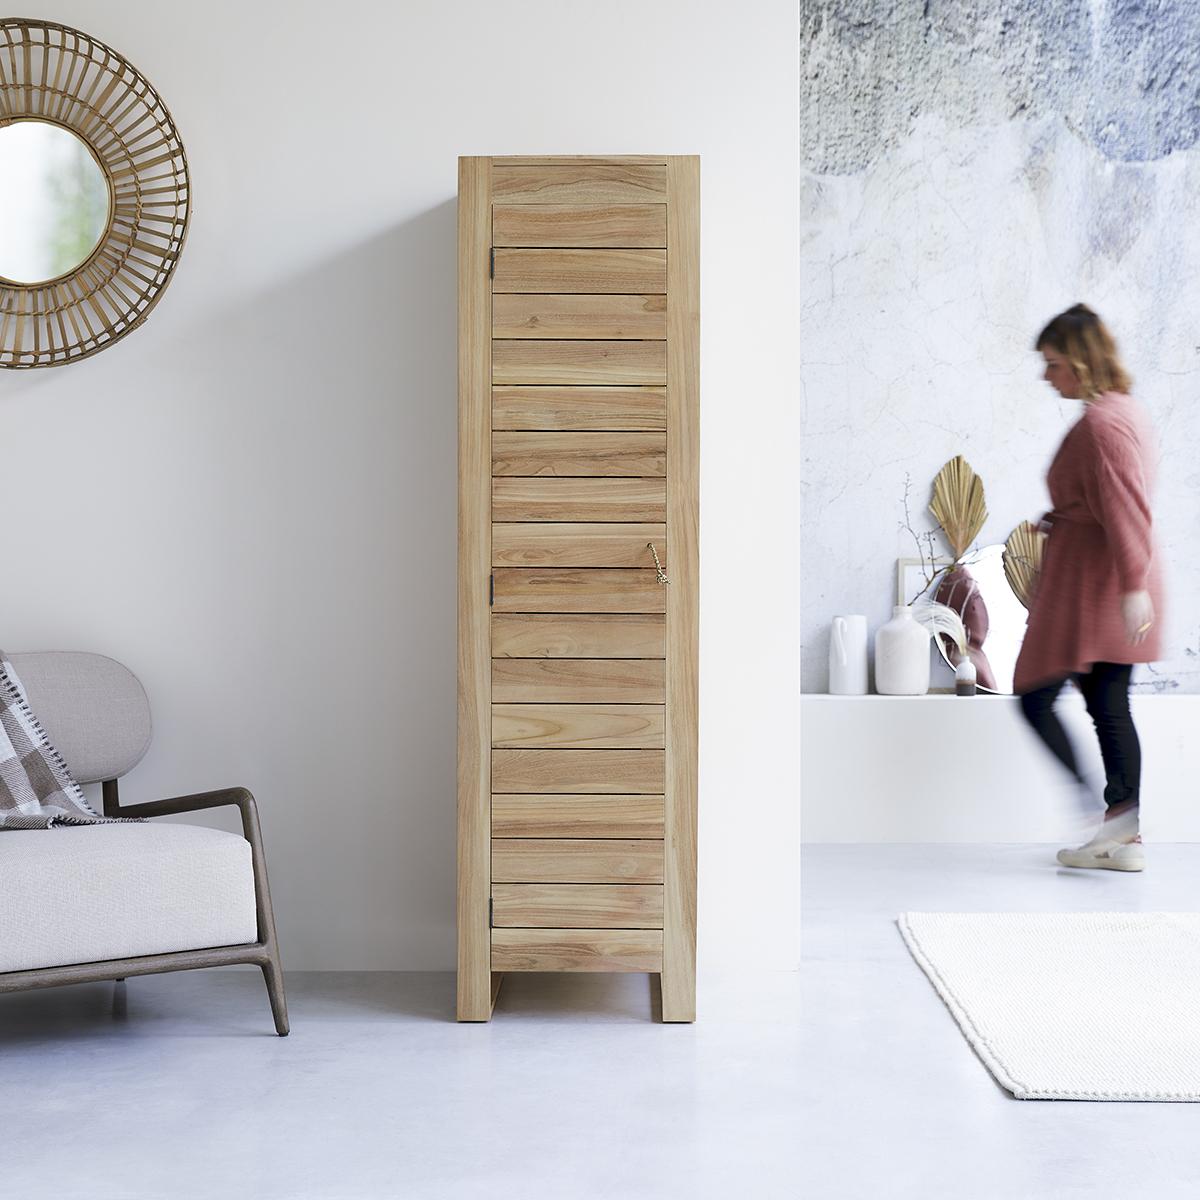 Minimalys solid teak single storage Wardrobe